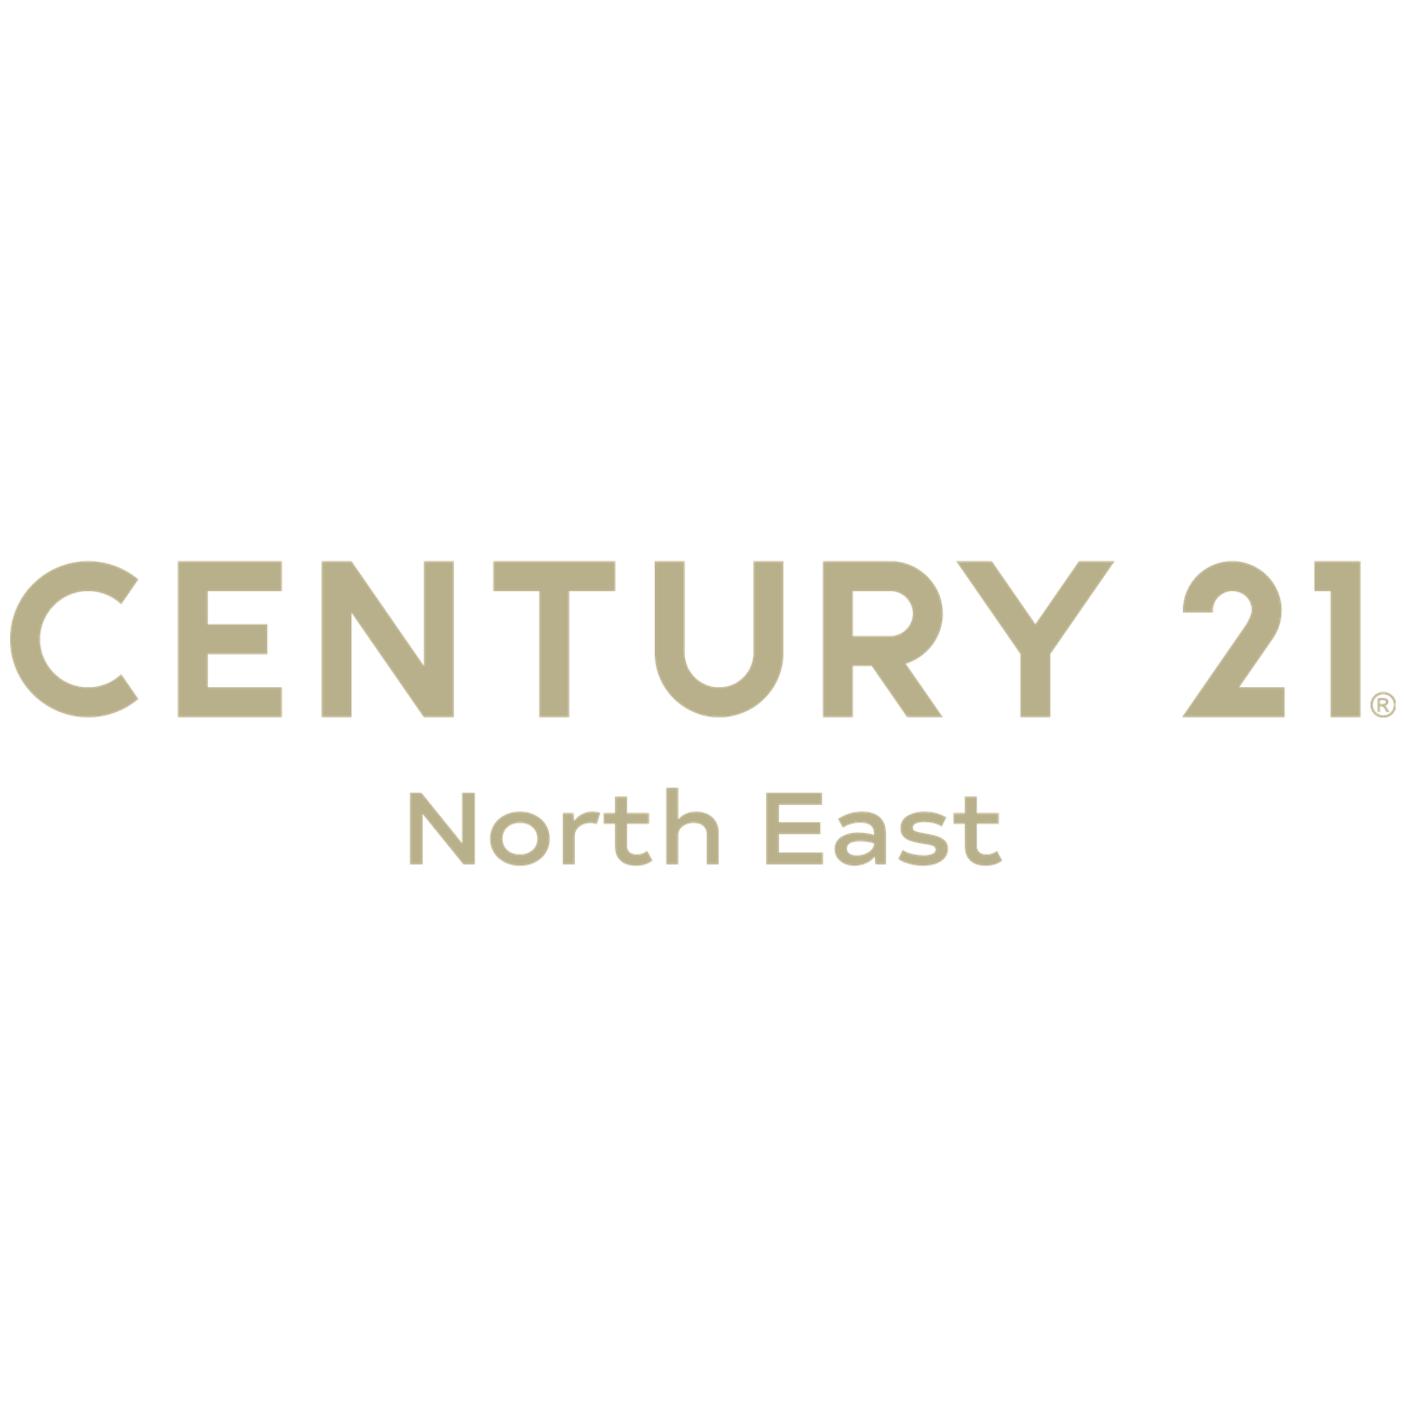 Century 21 North East - Samia Realty Group